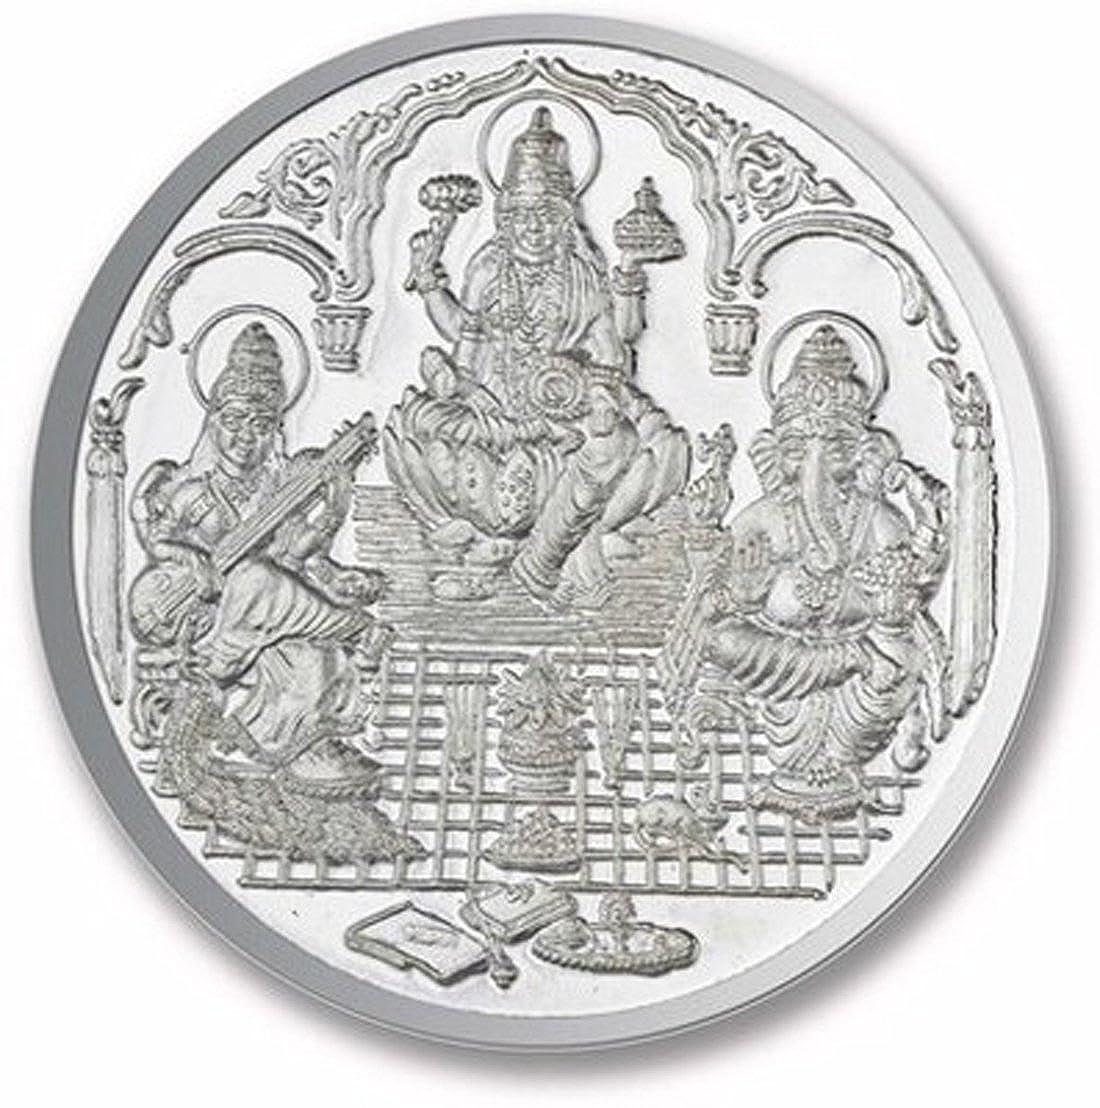 Ananth Jewels BIS Hallmarked 20 Grams Silver Coin